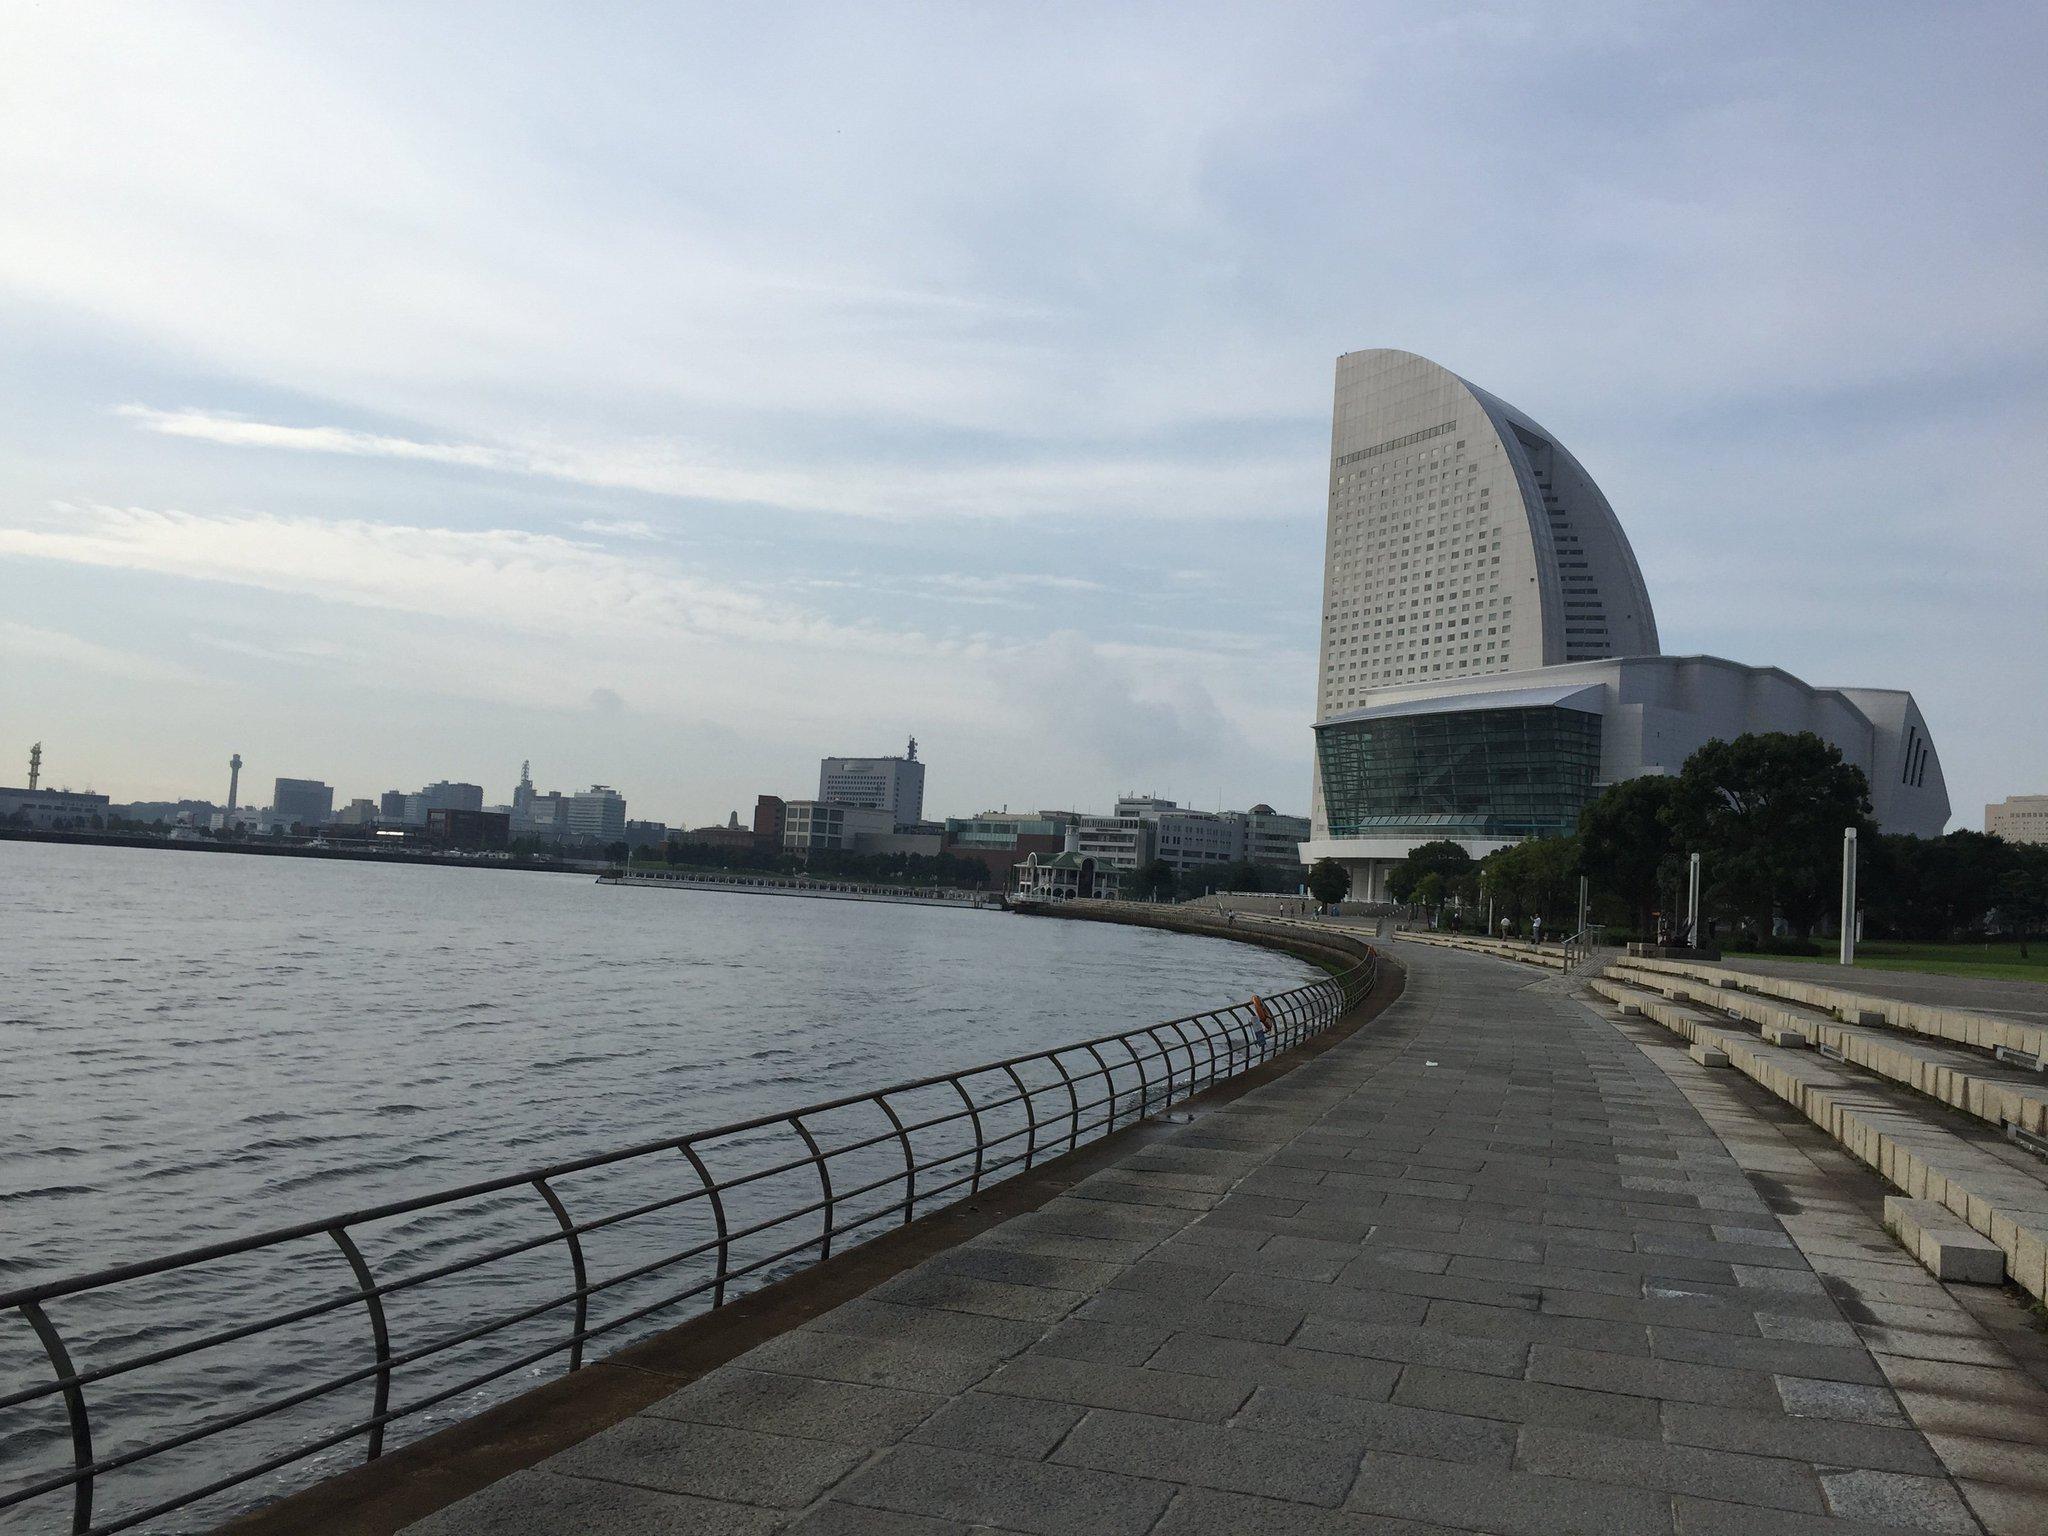 Good morning Yokohama! Great day for an morning run before #IASPCongress2016 kicks off. @CNBPscience https://t.co/JHn89GlCfD